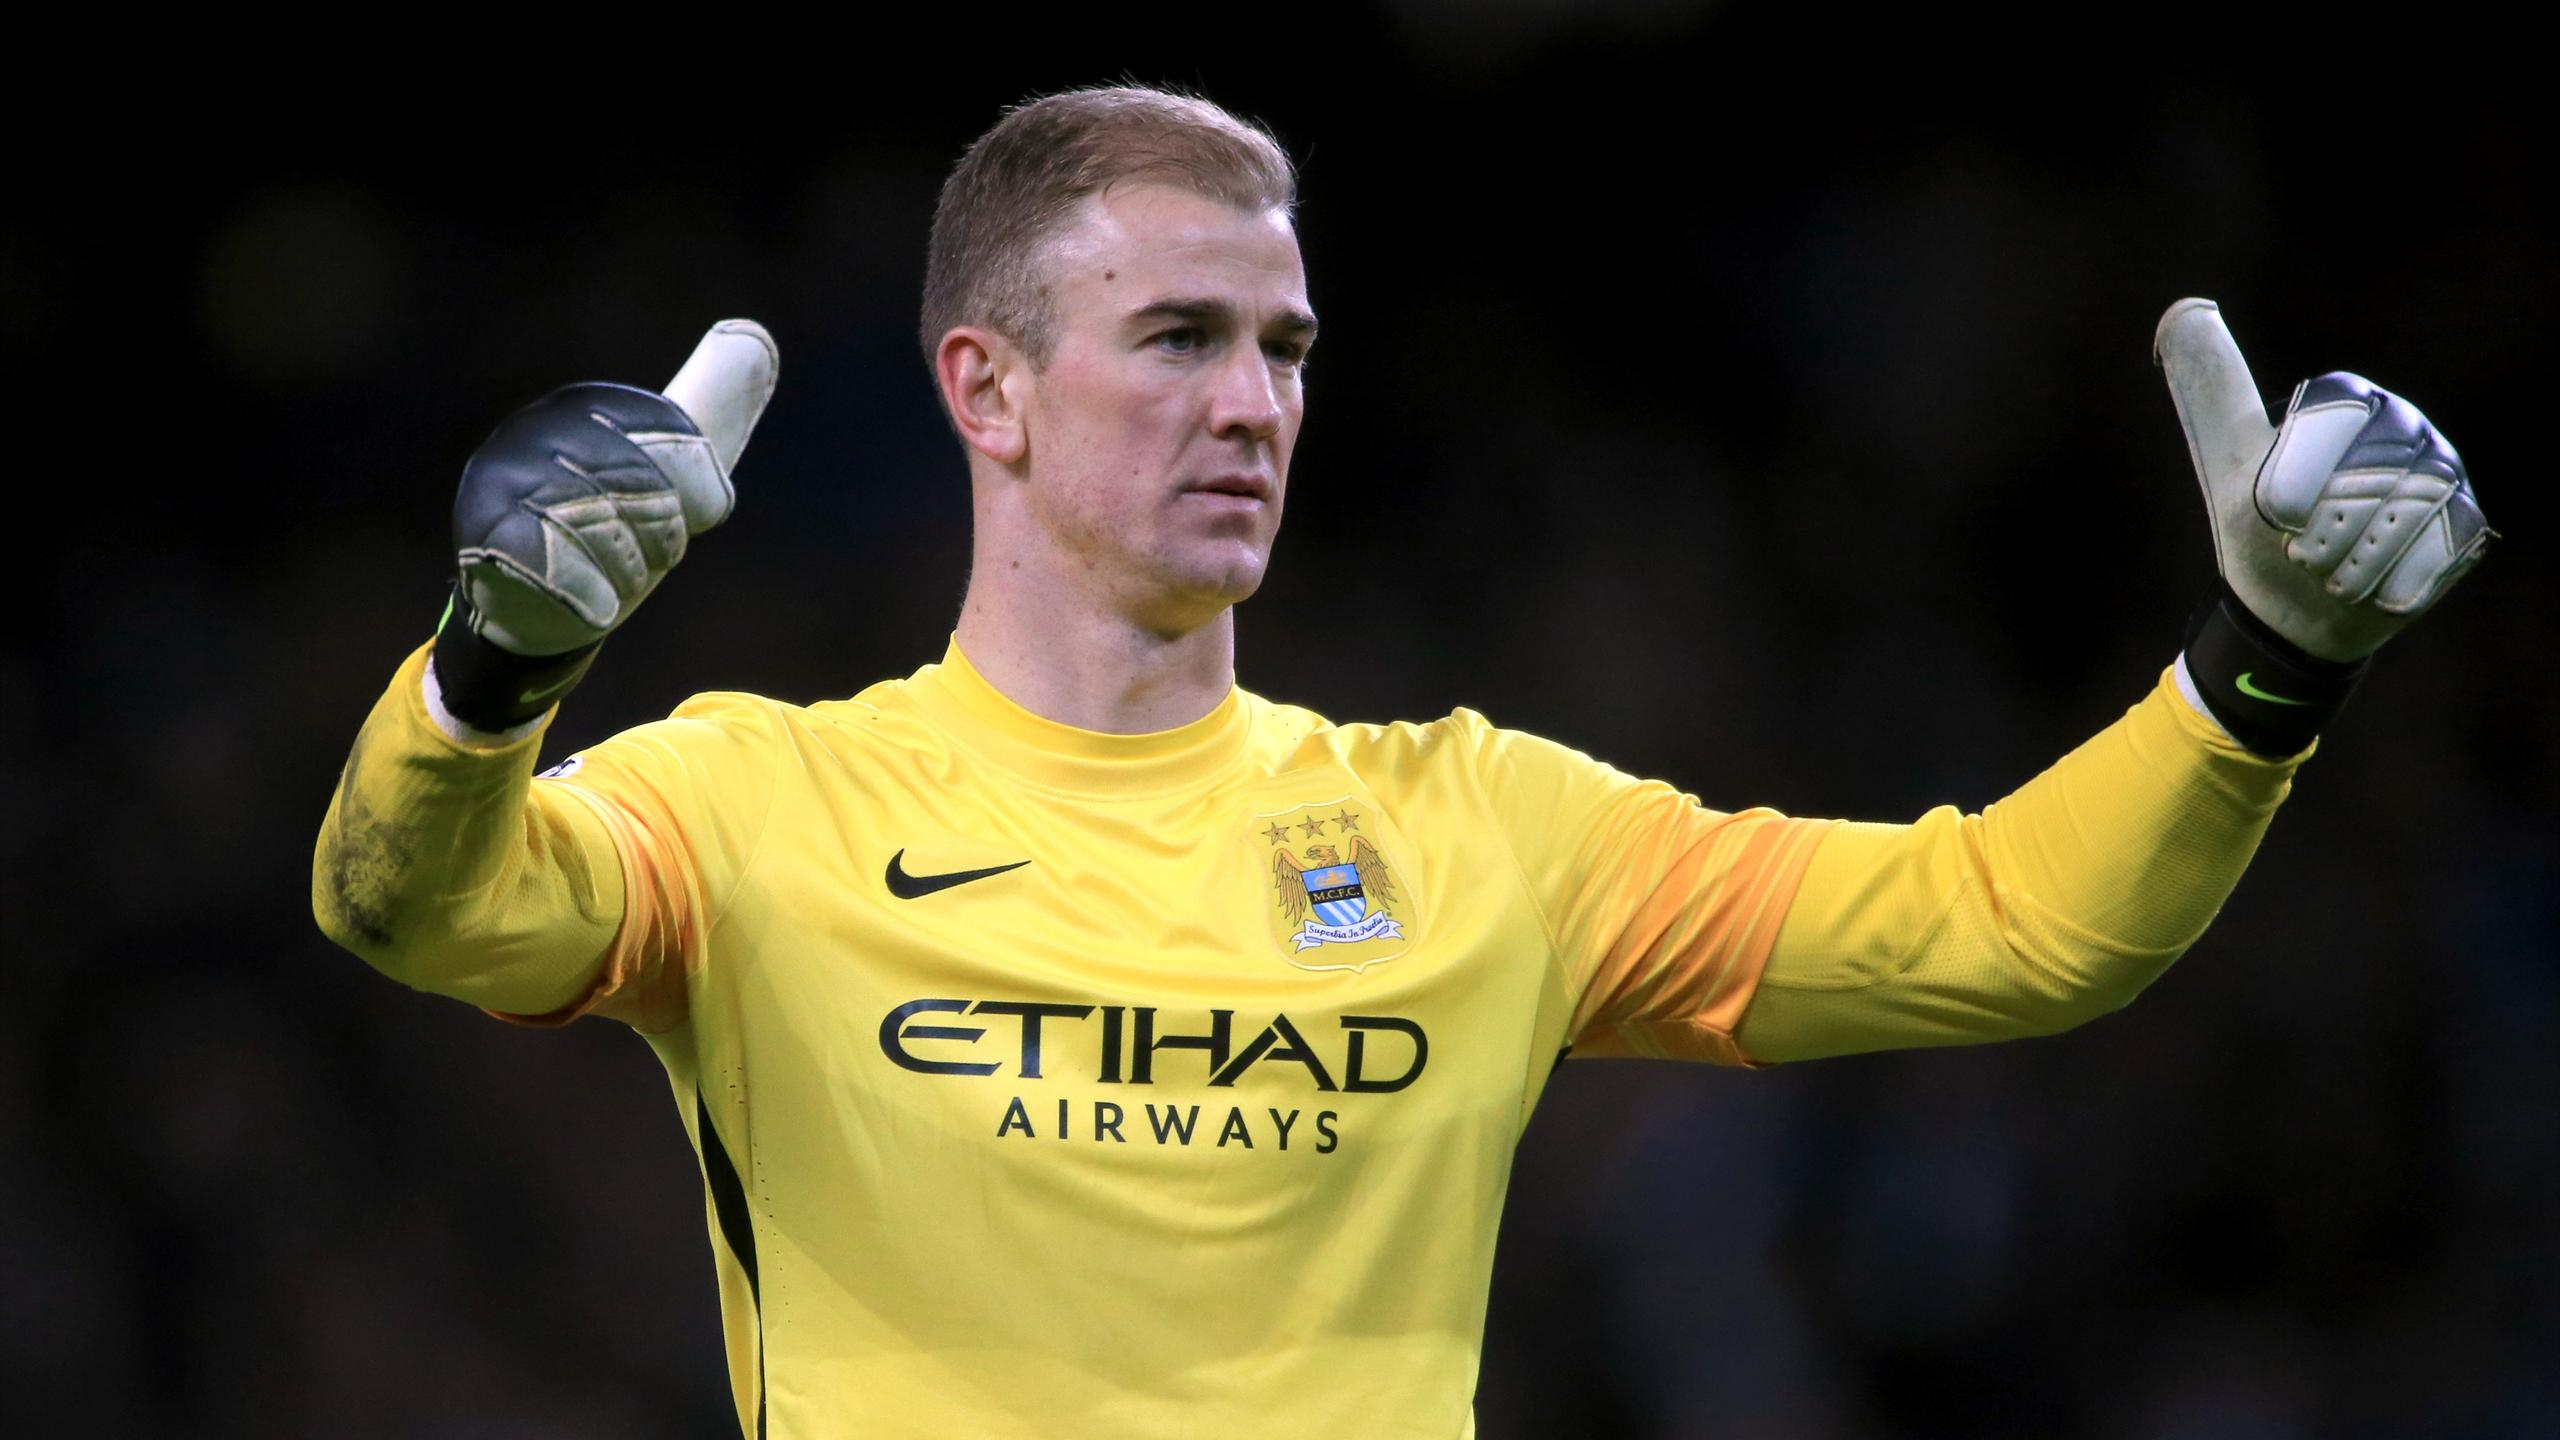 Manchester City goalkeeper Joe Hart gives the thumbs up